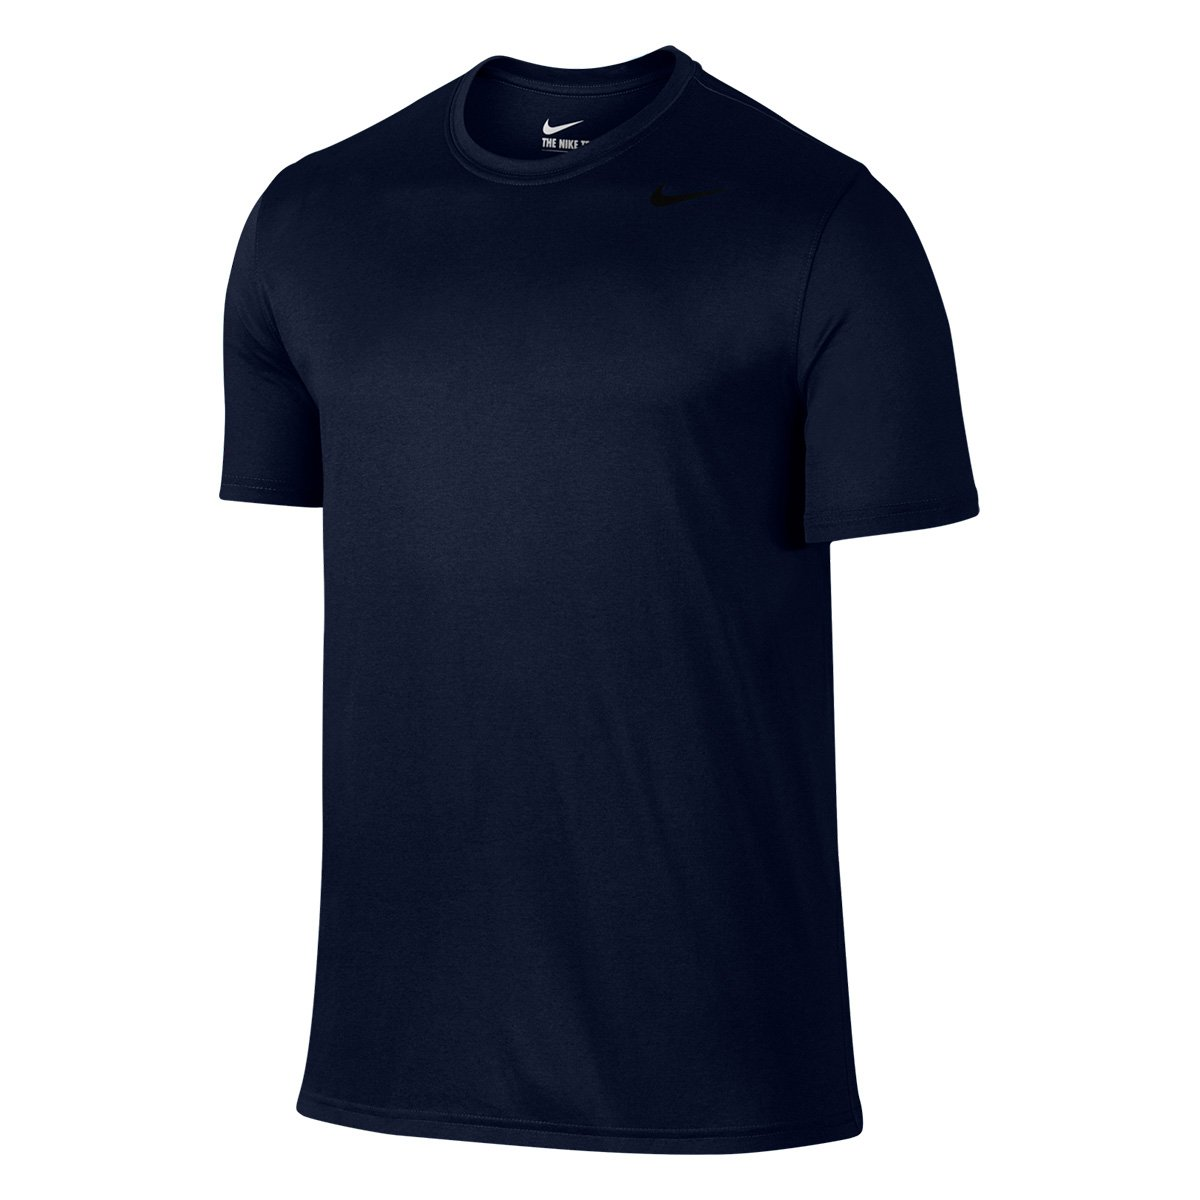 Camiseta Nike Dry Tee Legend Masculina - Chumbo